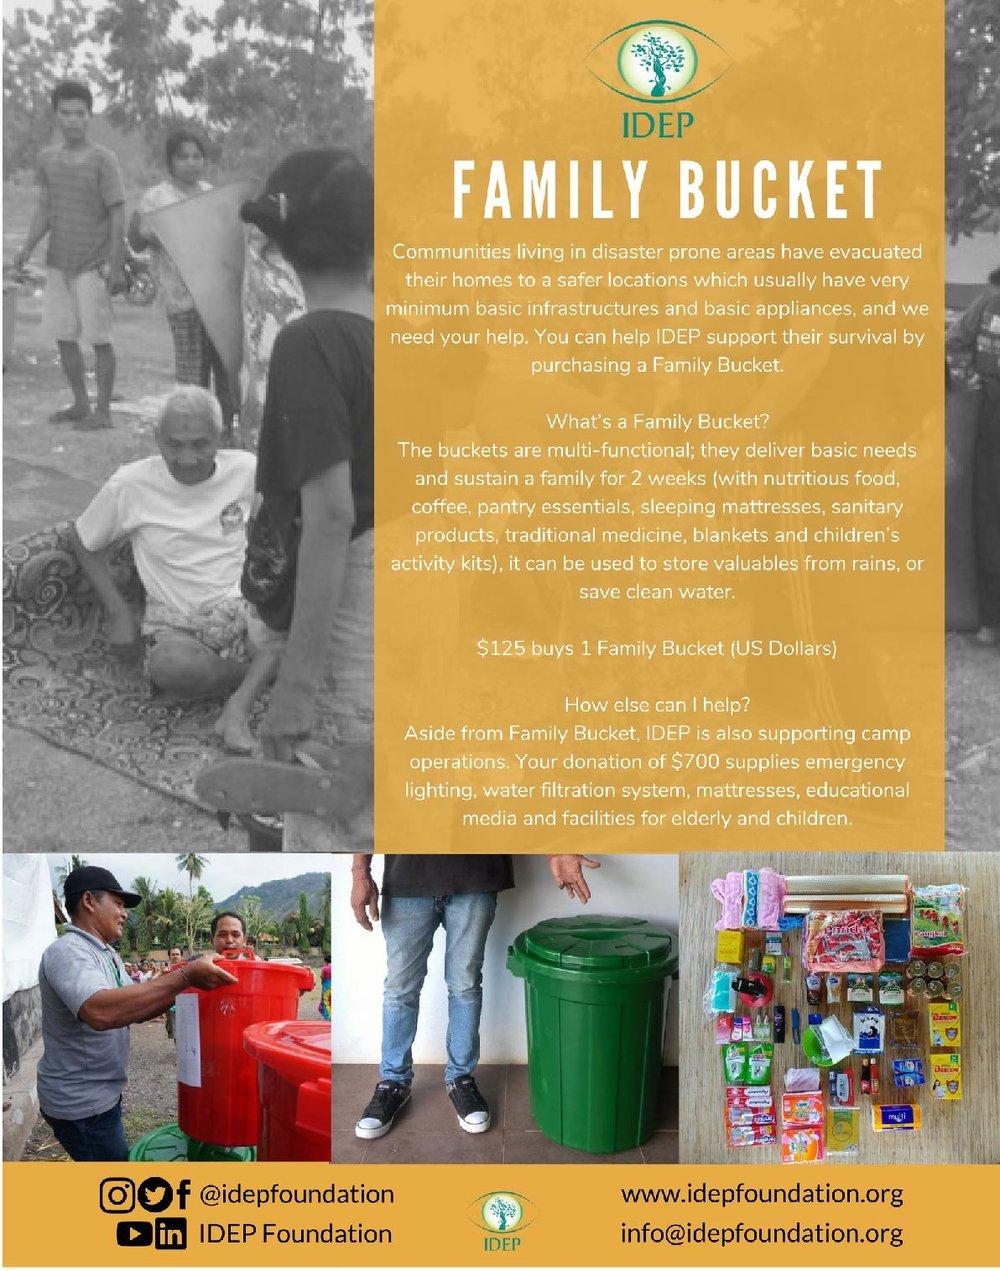 IDEP Family Bucket-2-01.jpg